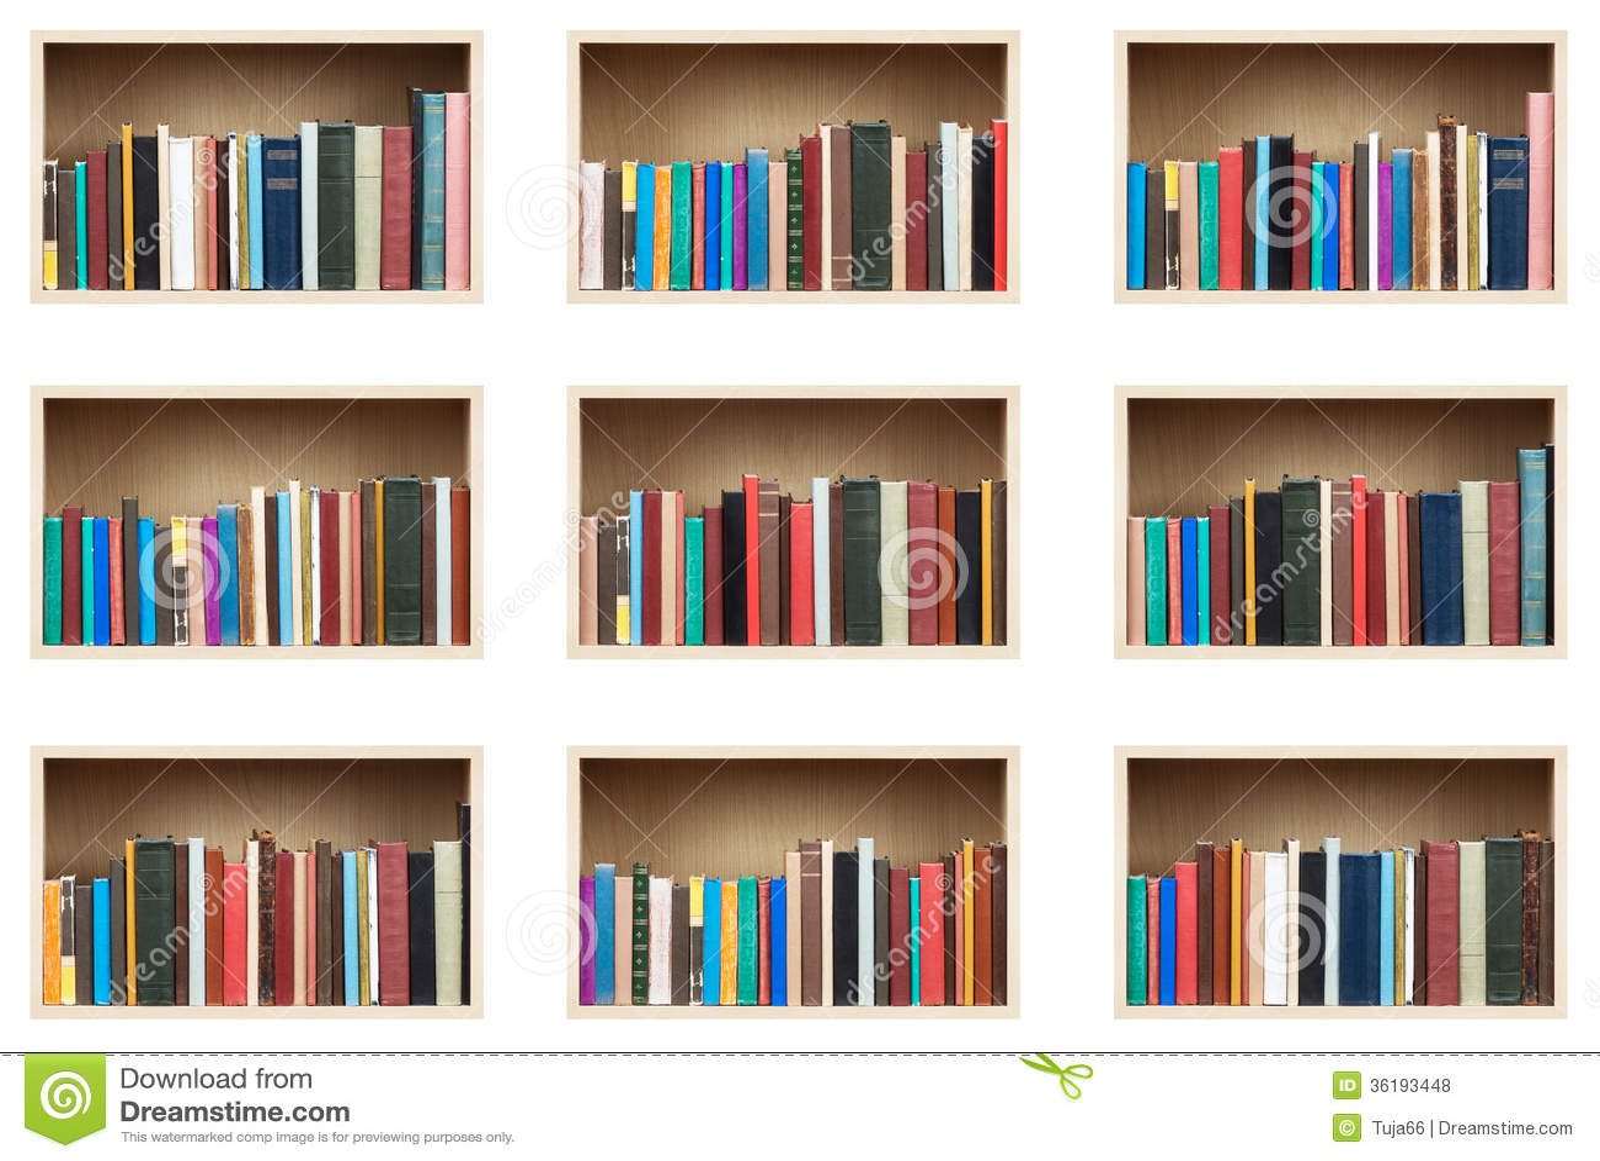 Books Royalty Free Stock Photos Image 36193448